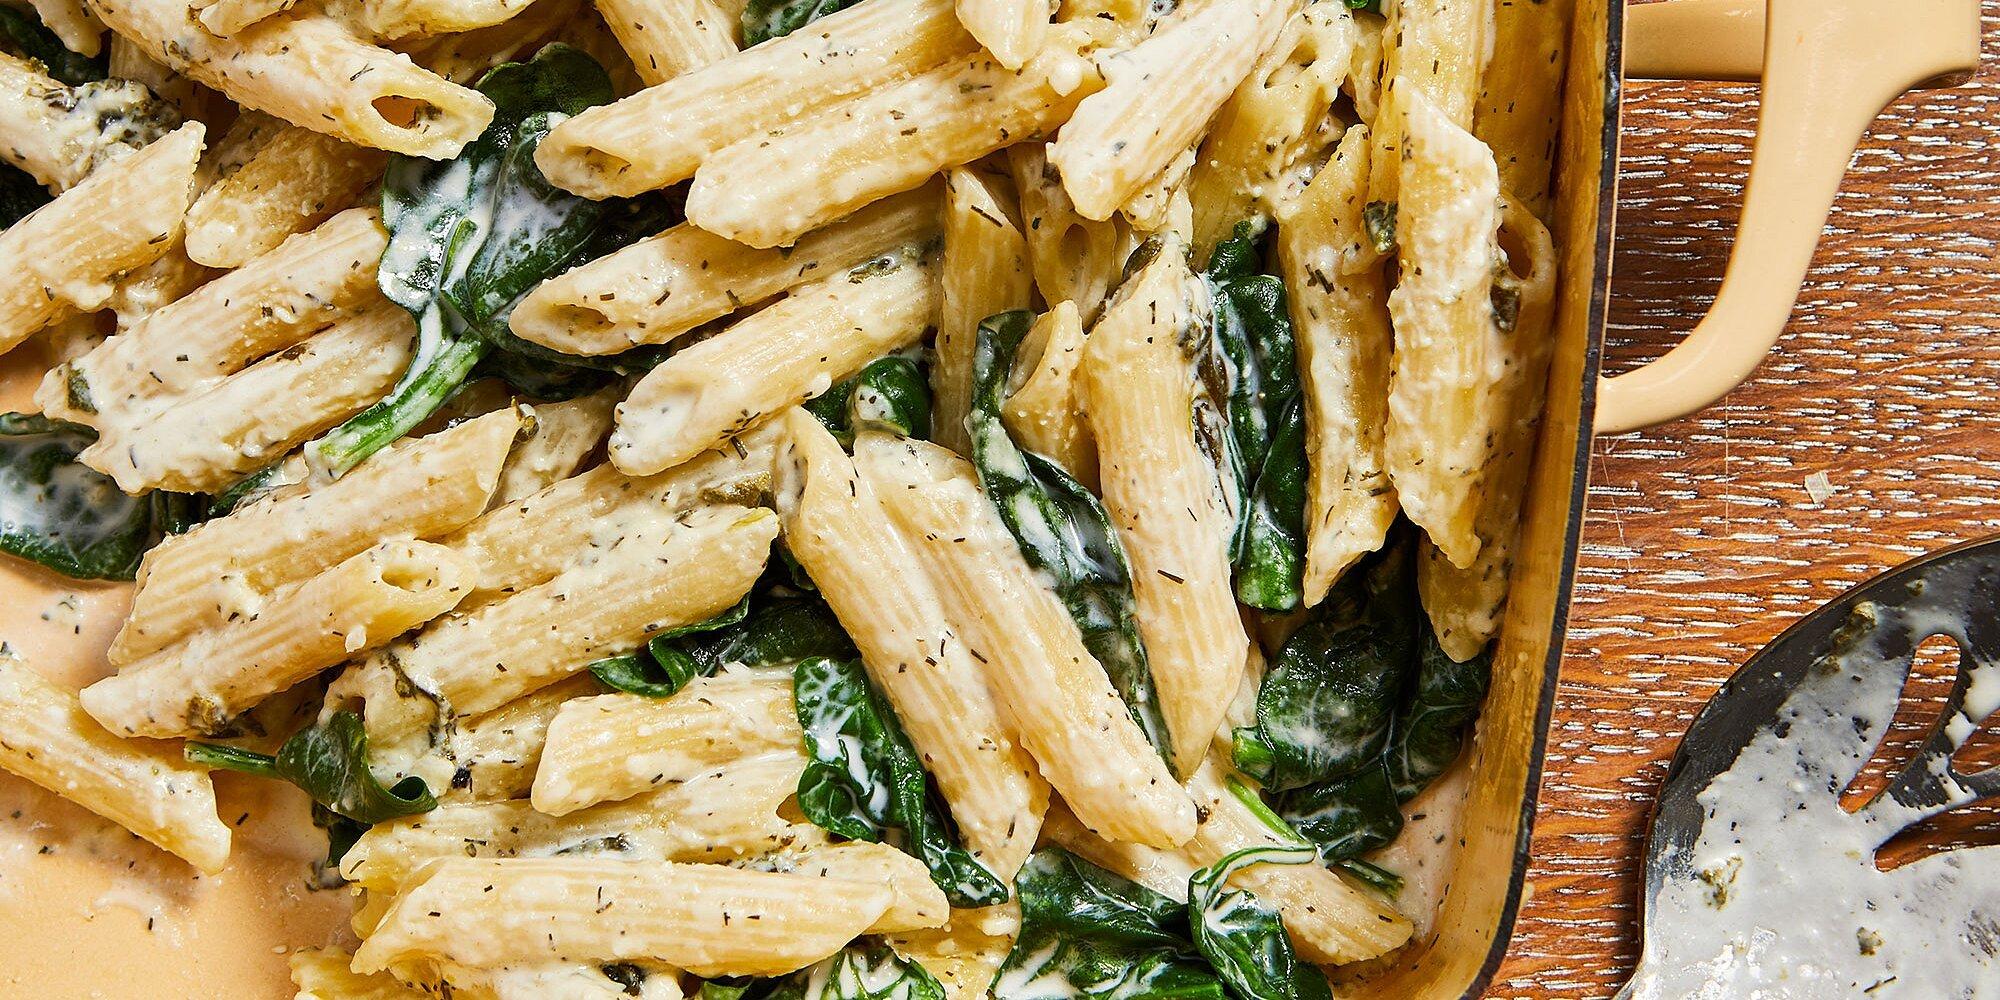 Baked Spinach & Feta Pasta